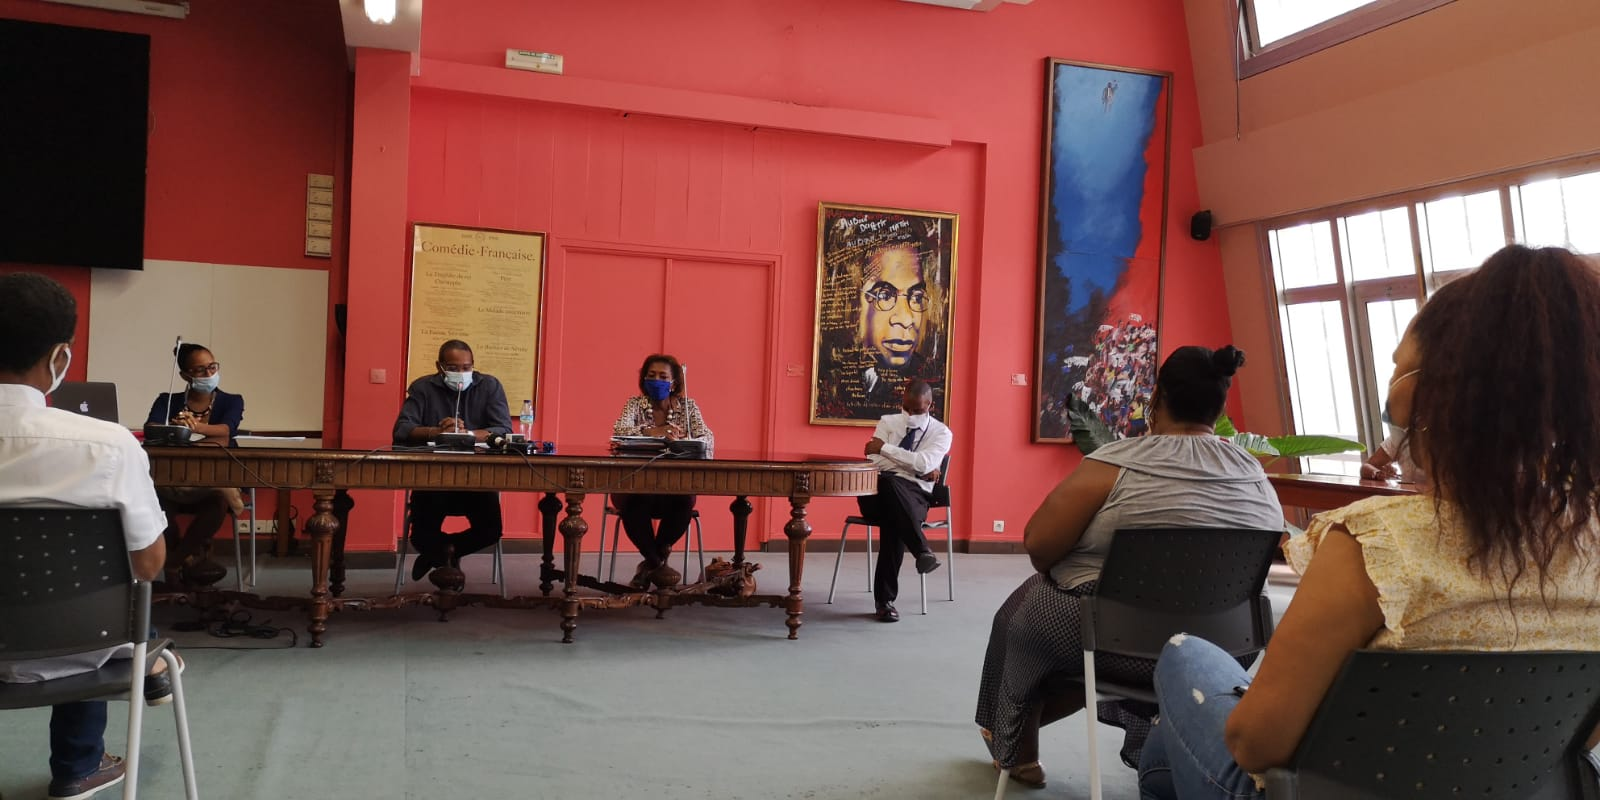 Fort-de-France : La statue d'Esnambuc bientôt retirée